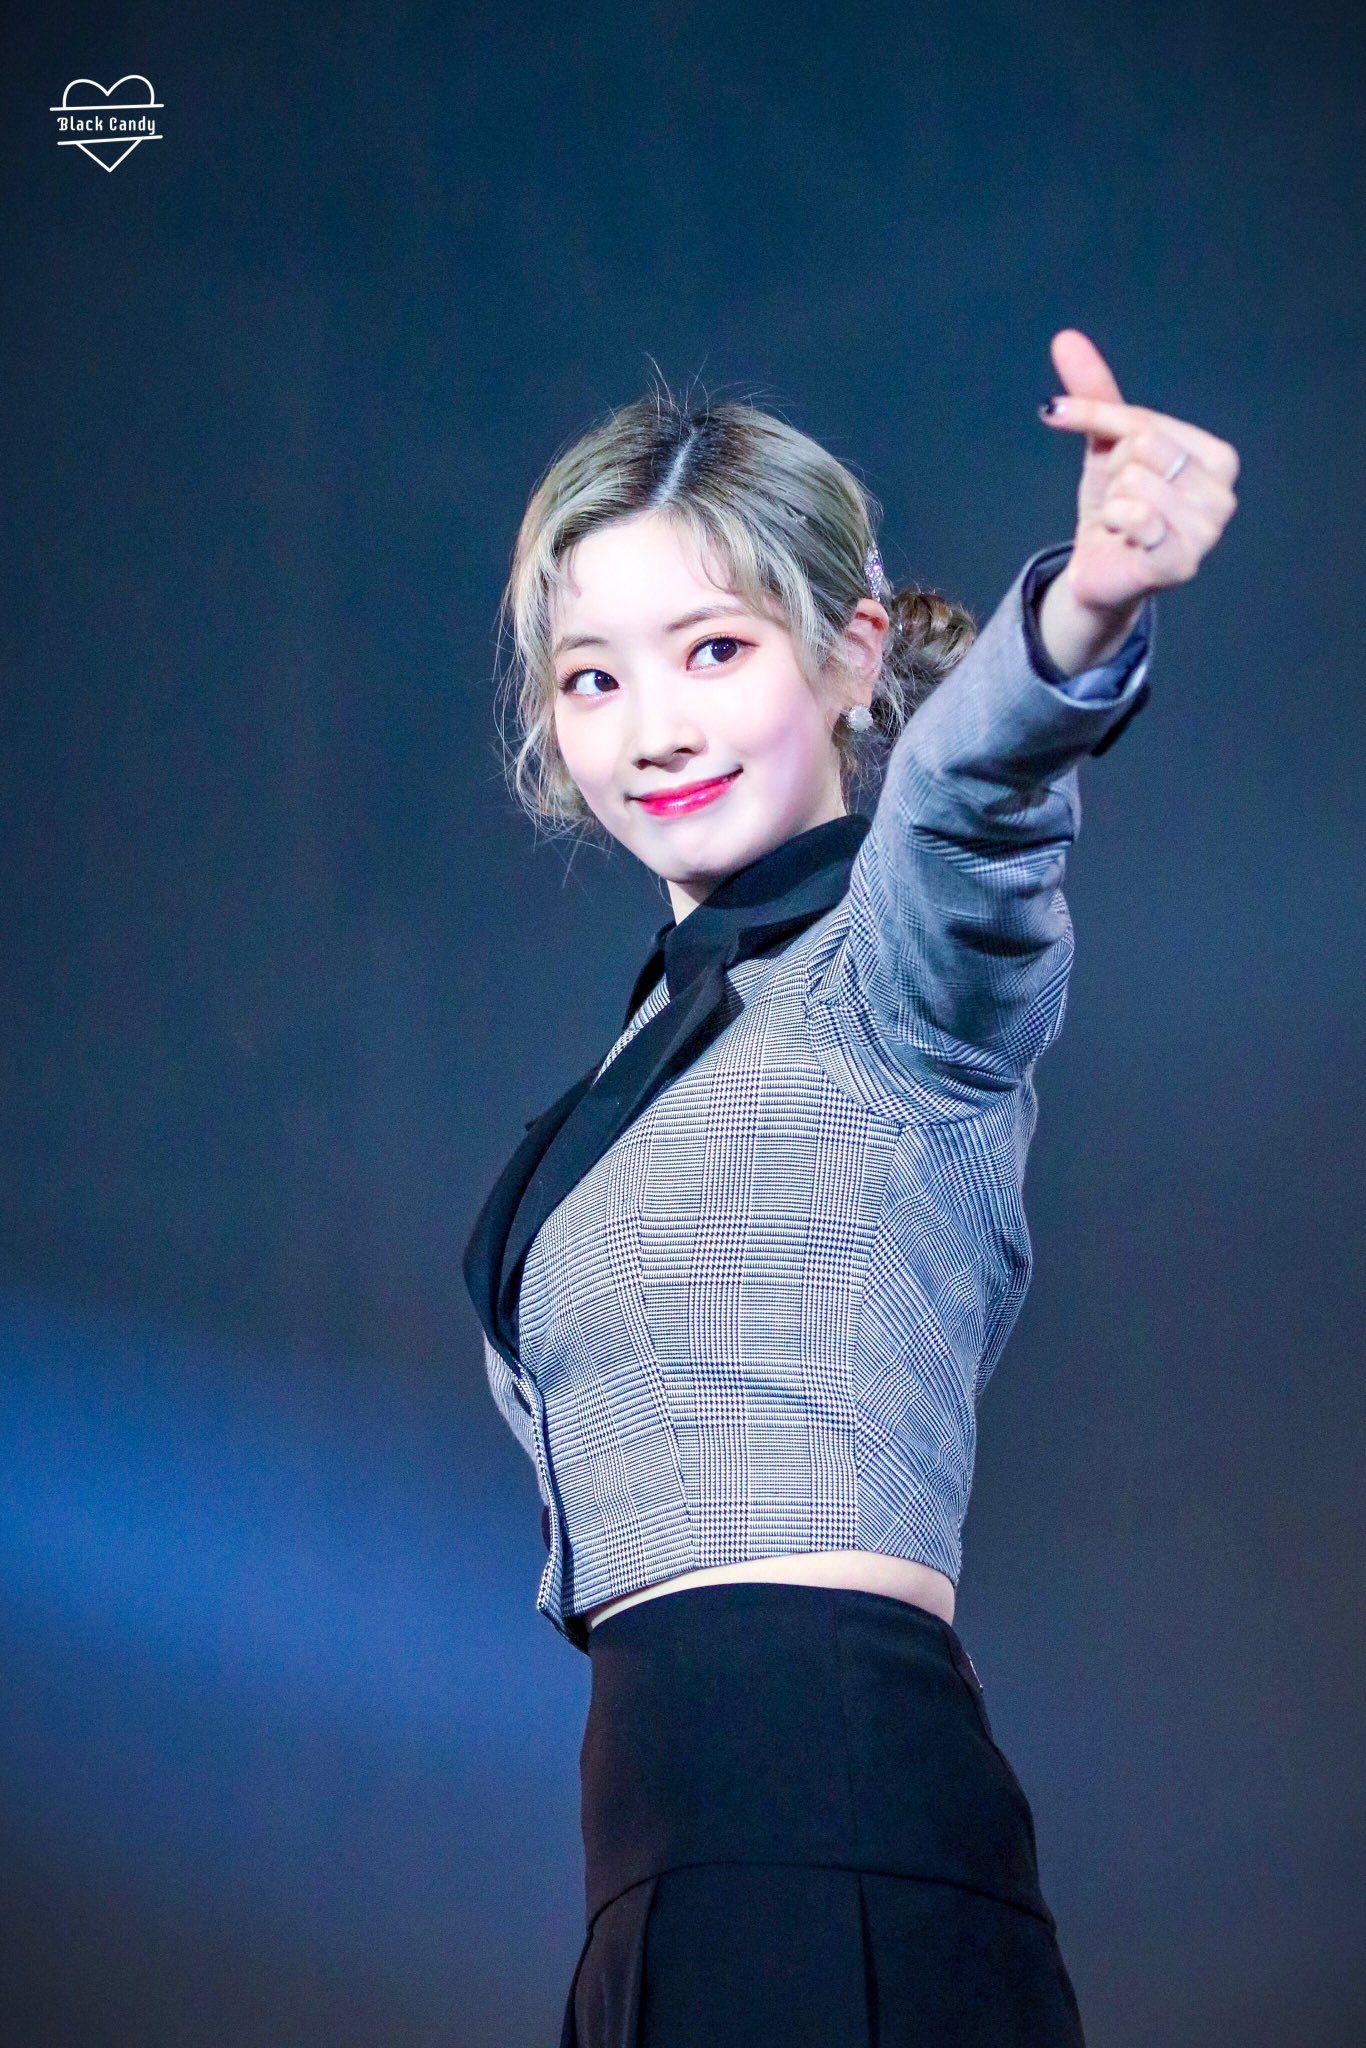 Dahyun kpop kdrama bts exo kpoparmy korean girl